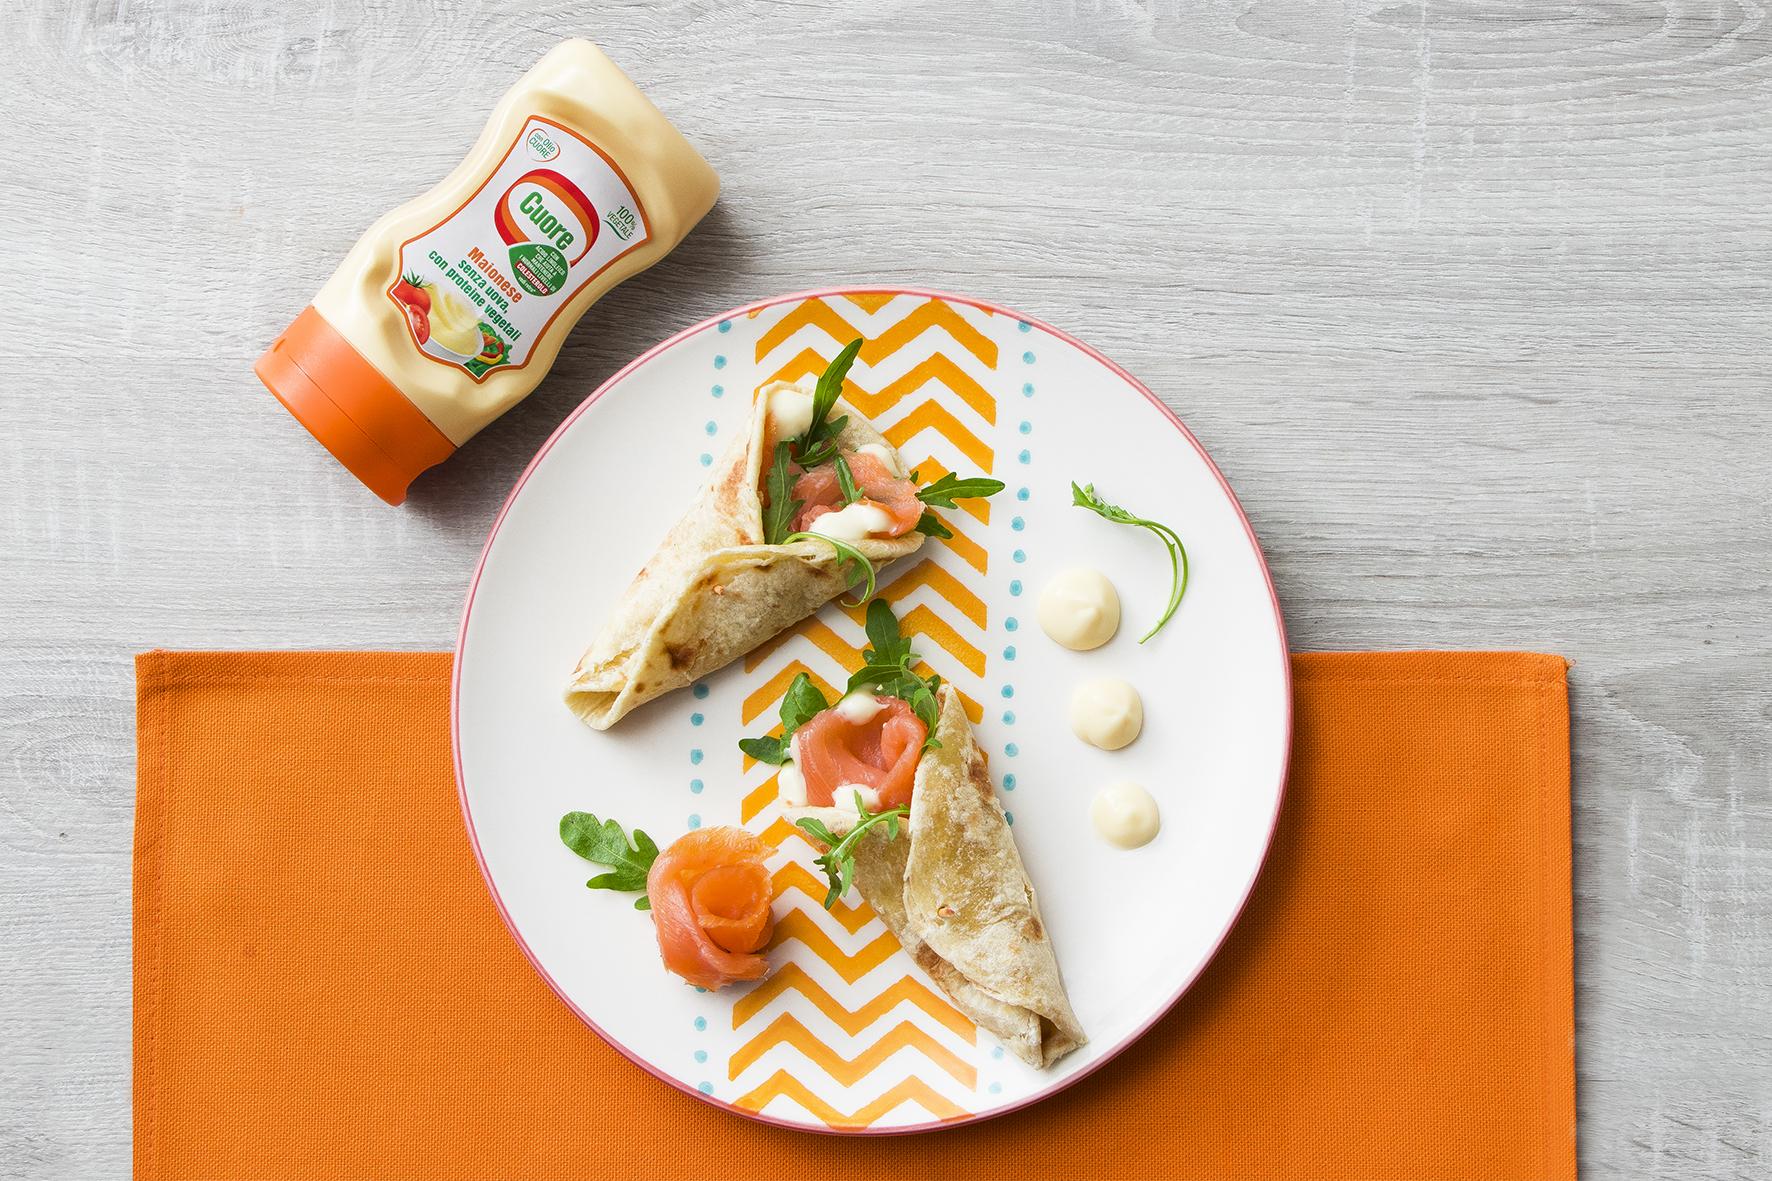 Wrap con salmone affumicato, rucola e maionese